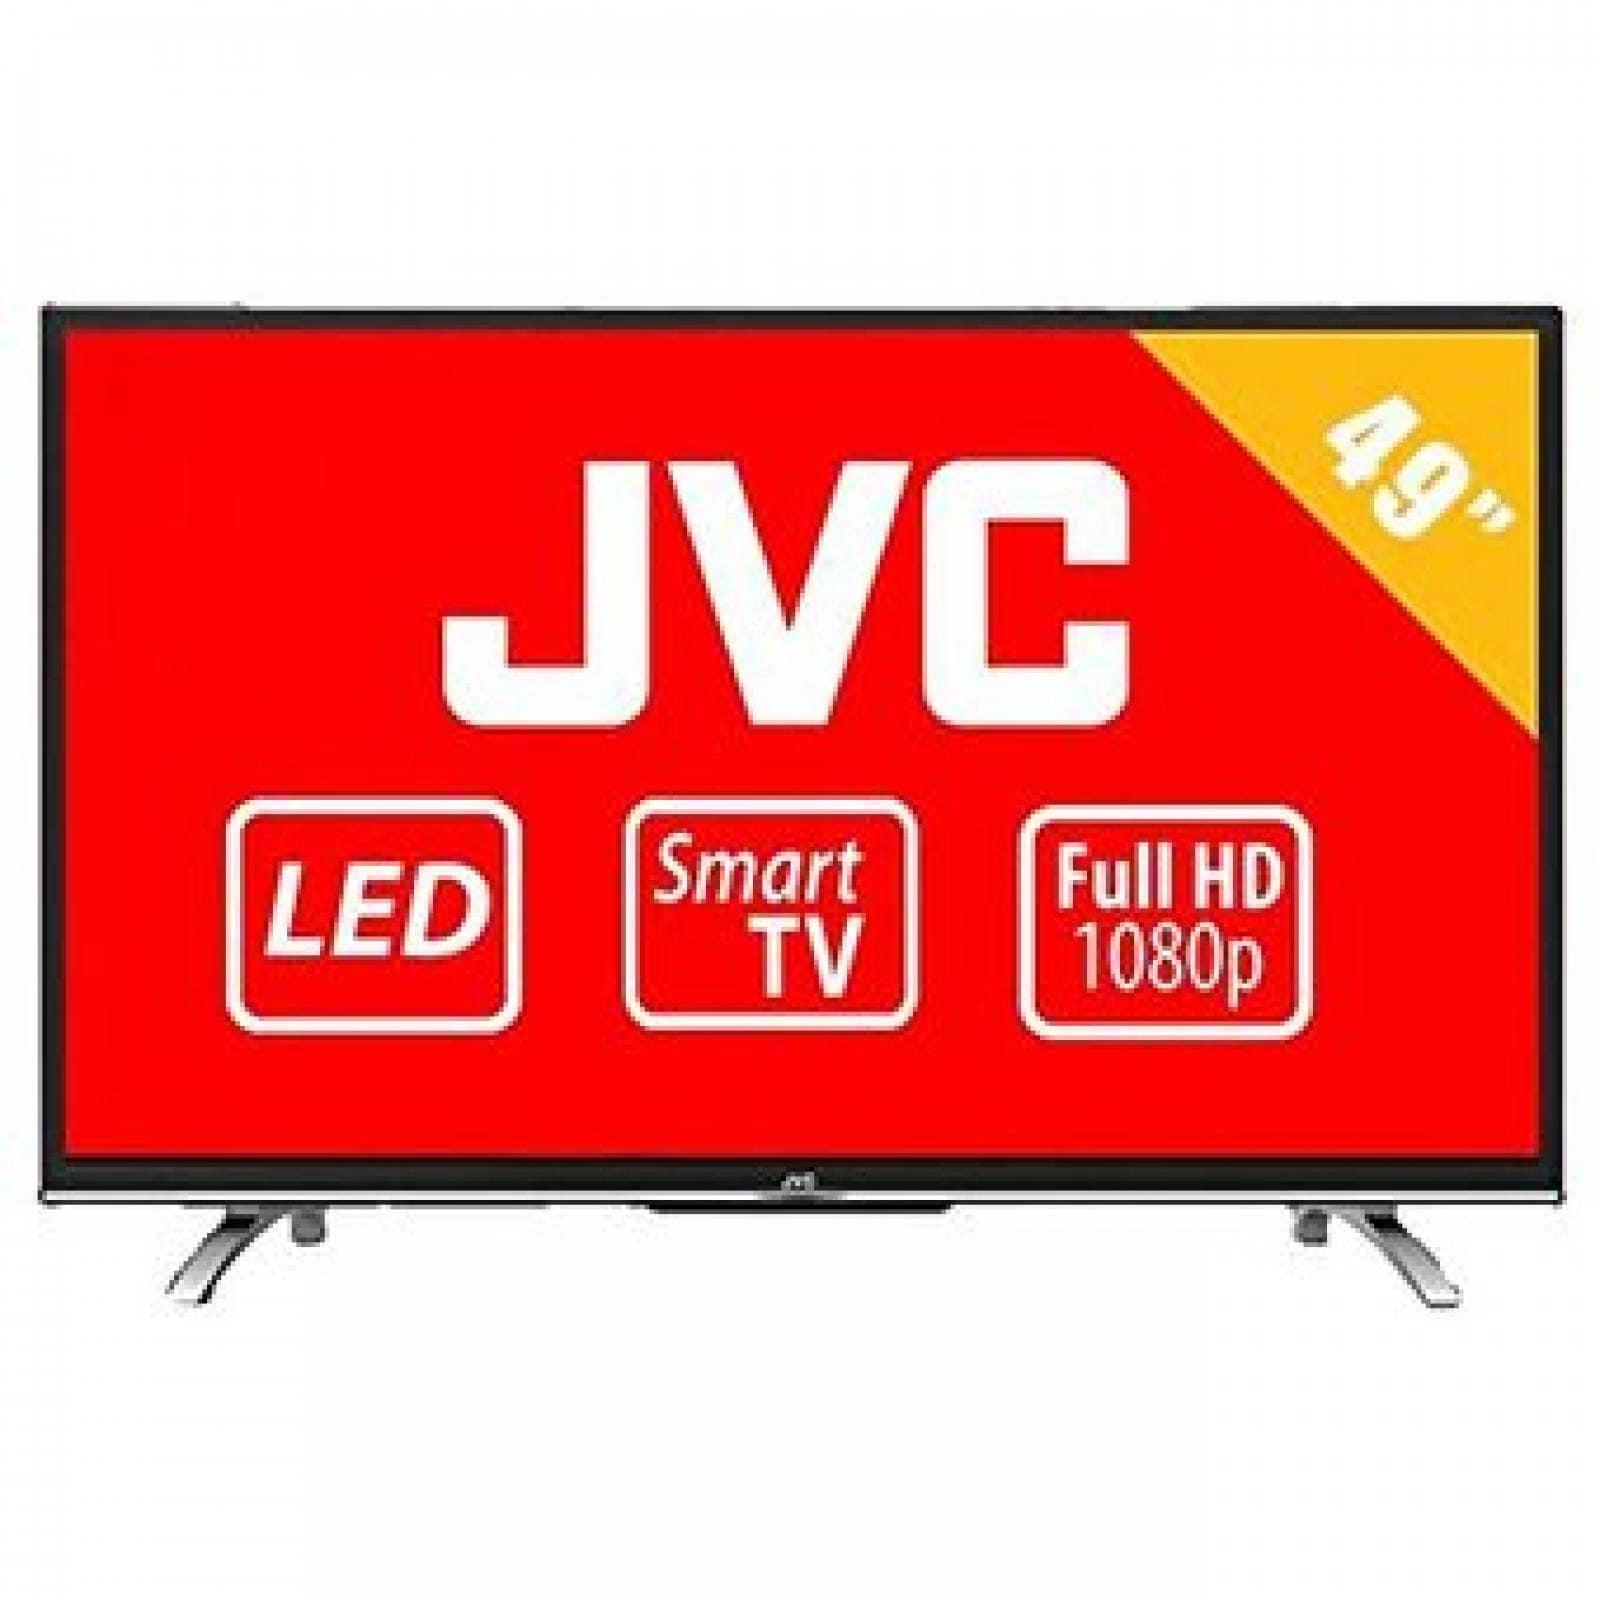 "Pantalla De 49"" Led, Smart Tv Marca JVC"